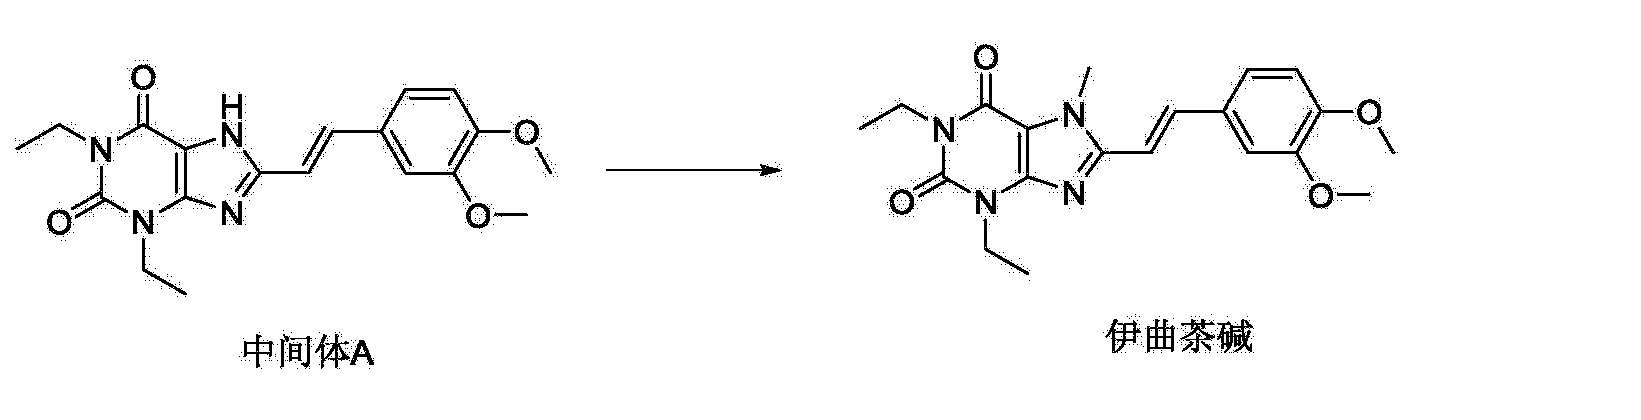 Figure CN104744464AD00051